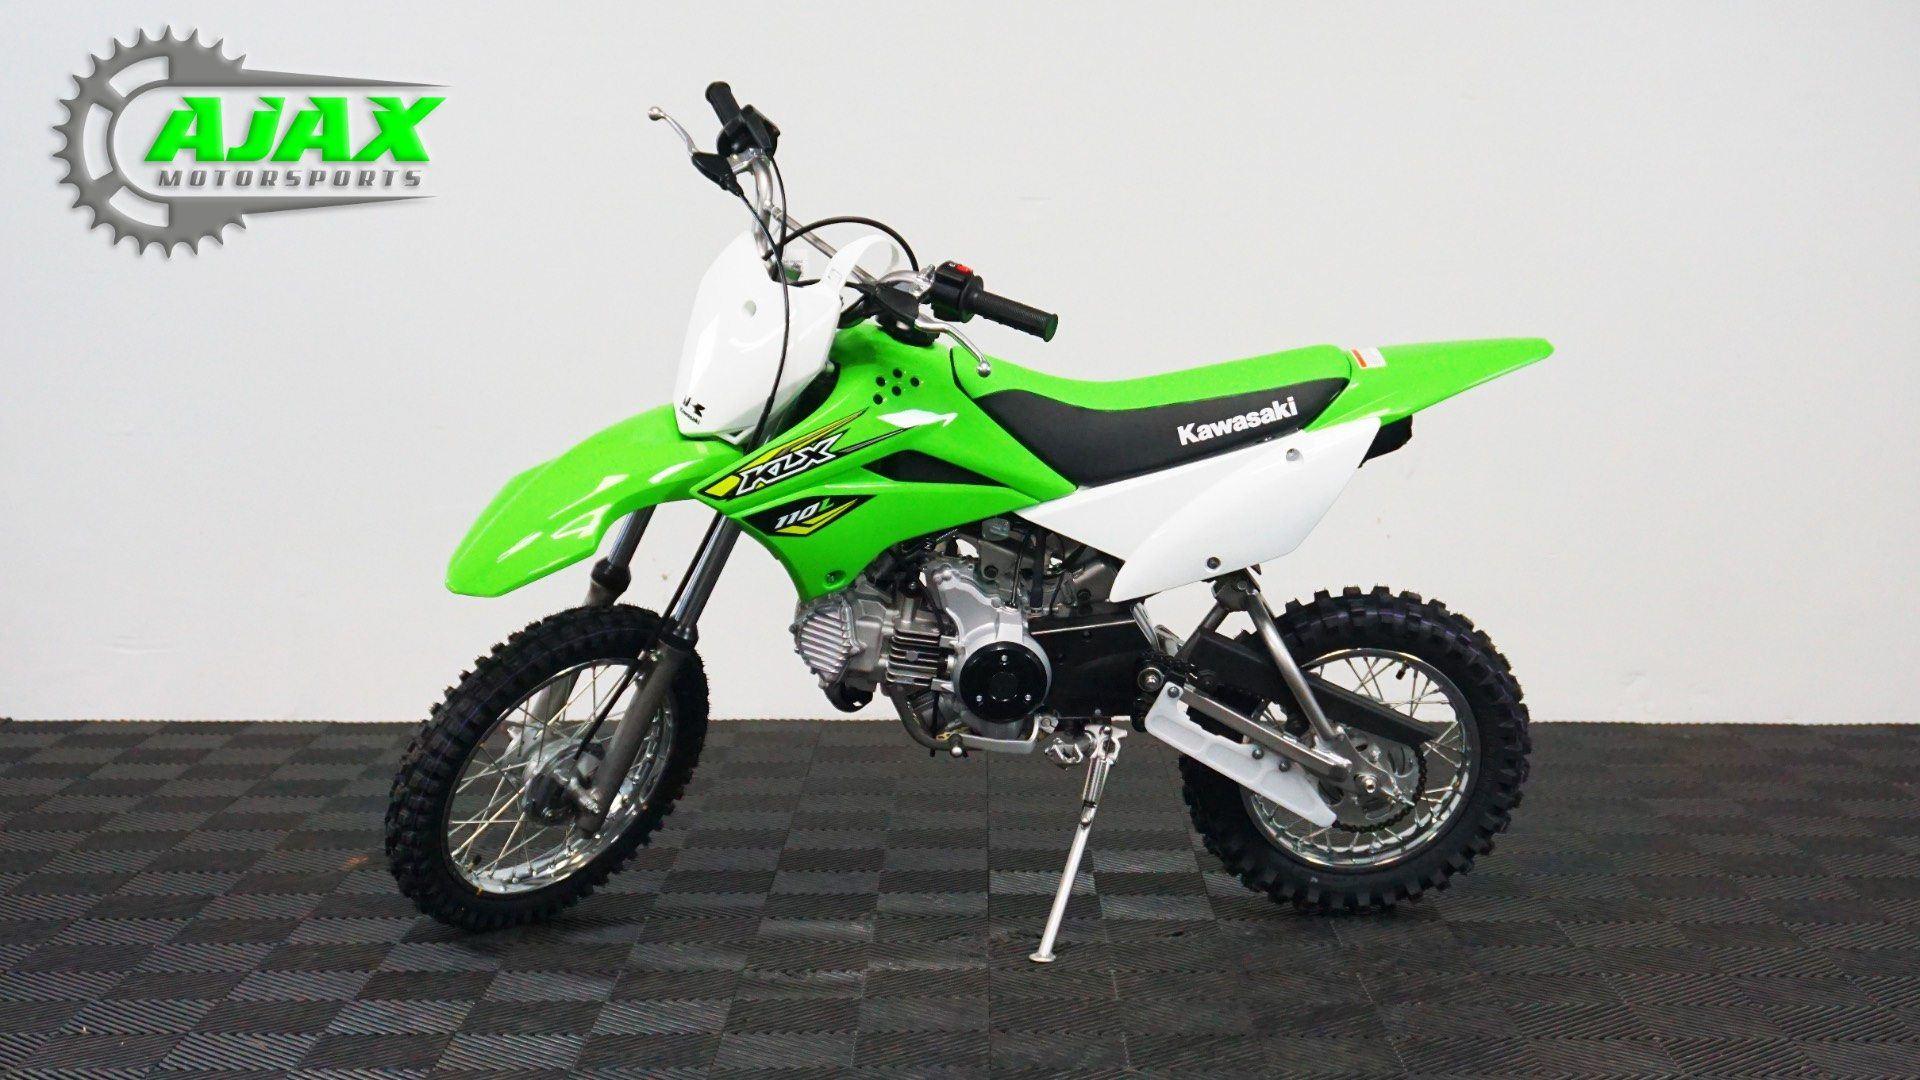 New 2018 Kawasaki KLX 110L Motorcycles in Oklahoma City, OK   Stock